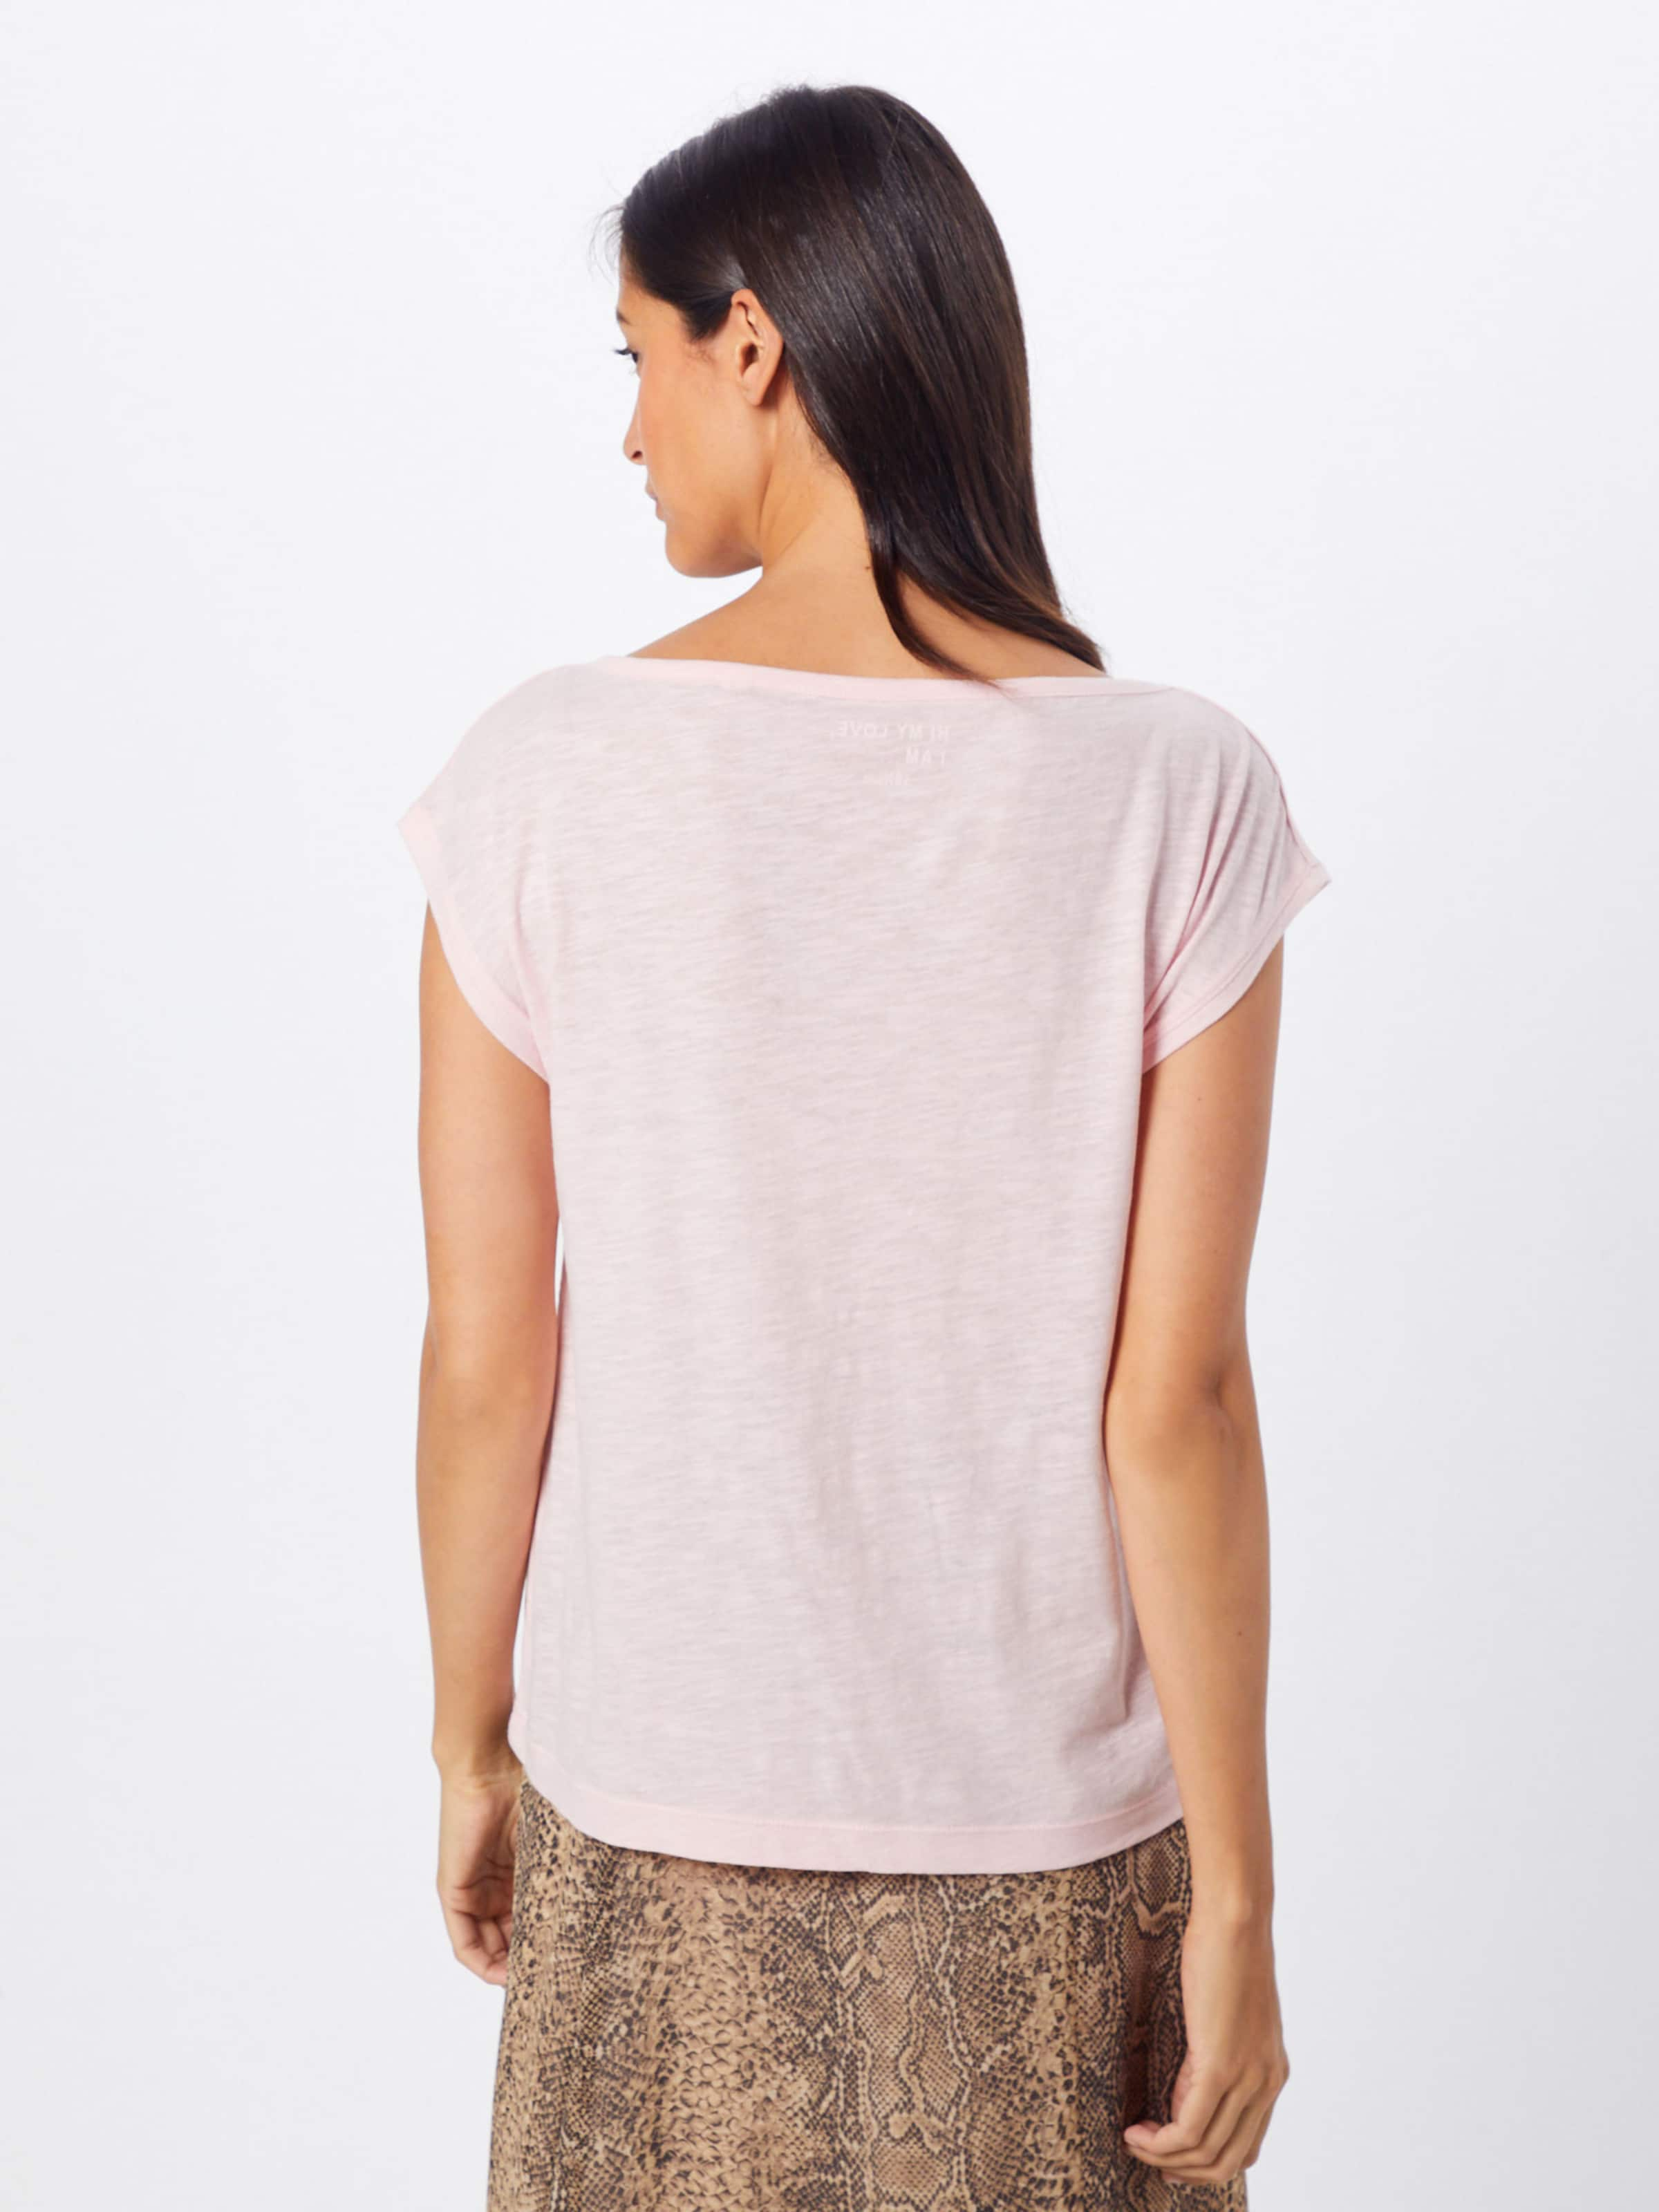 oliver S In T Rosé Red Label shirt ybf7YvgI6m